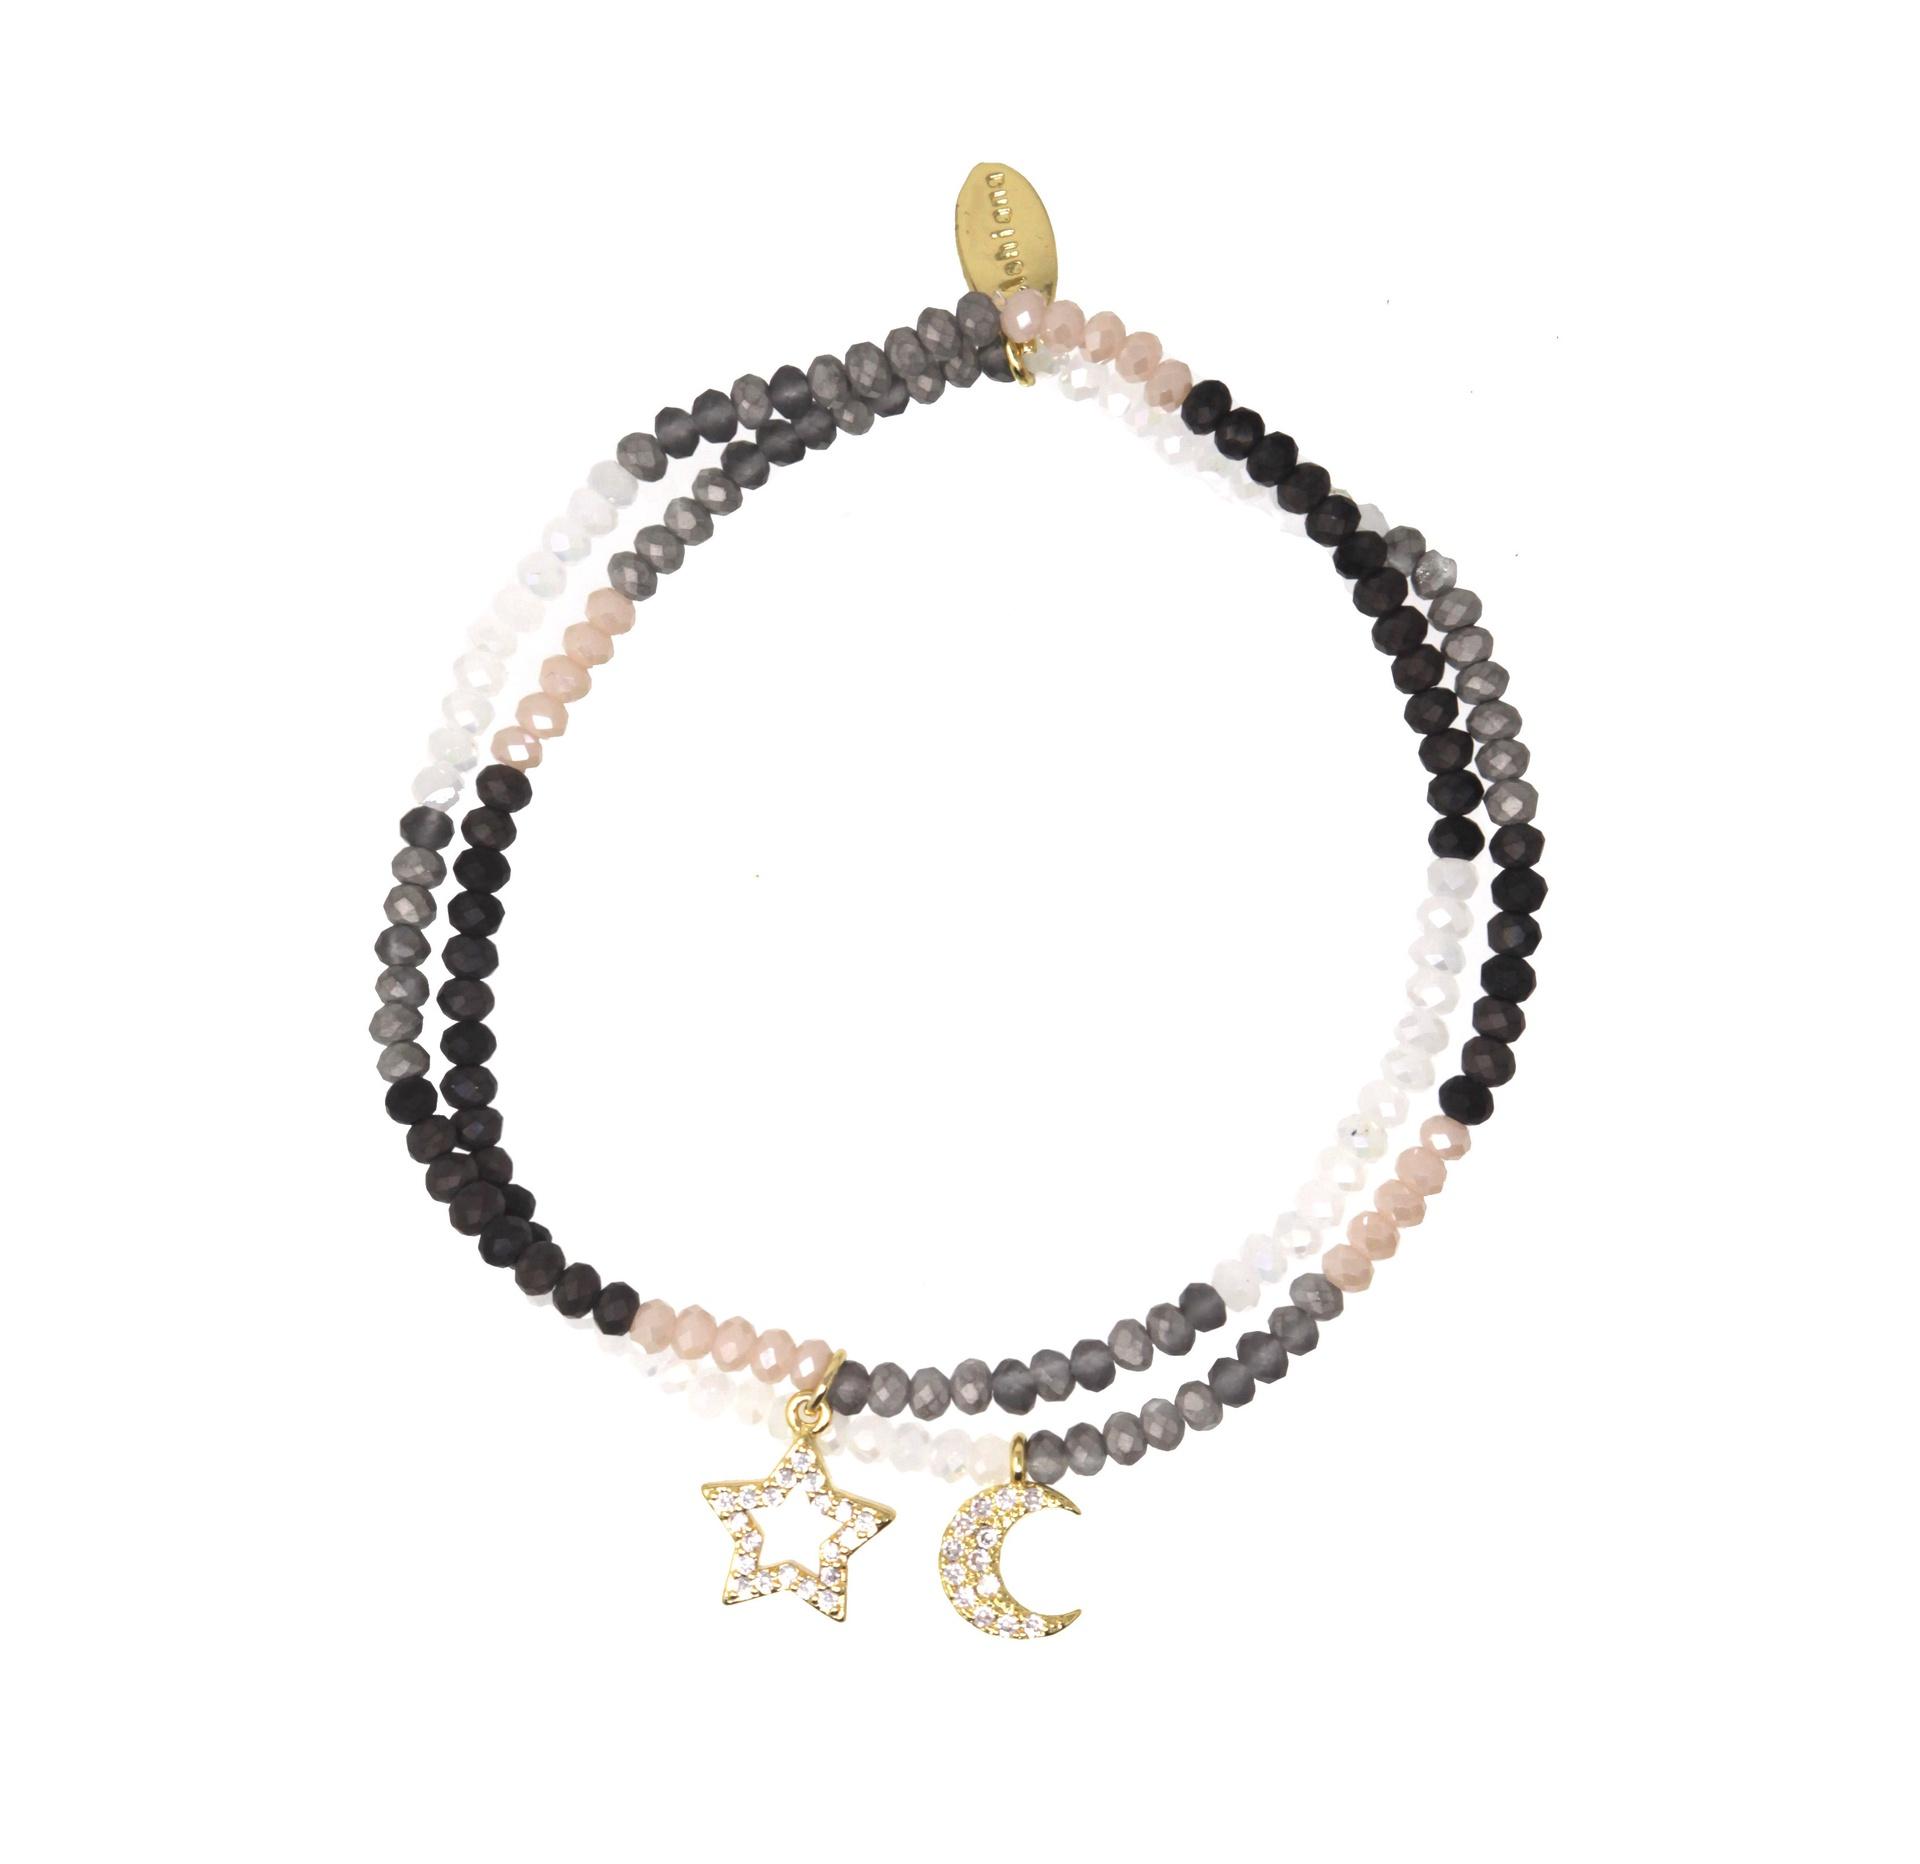 Star and Moon Charm Bracelet by Ashiana London